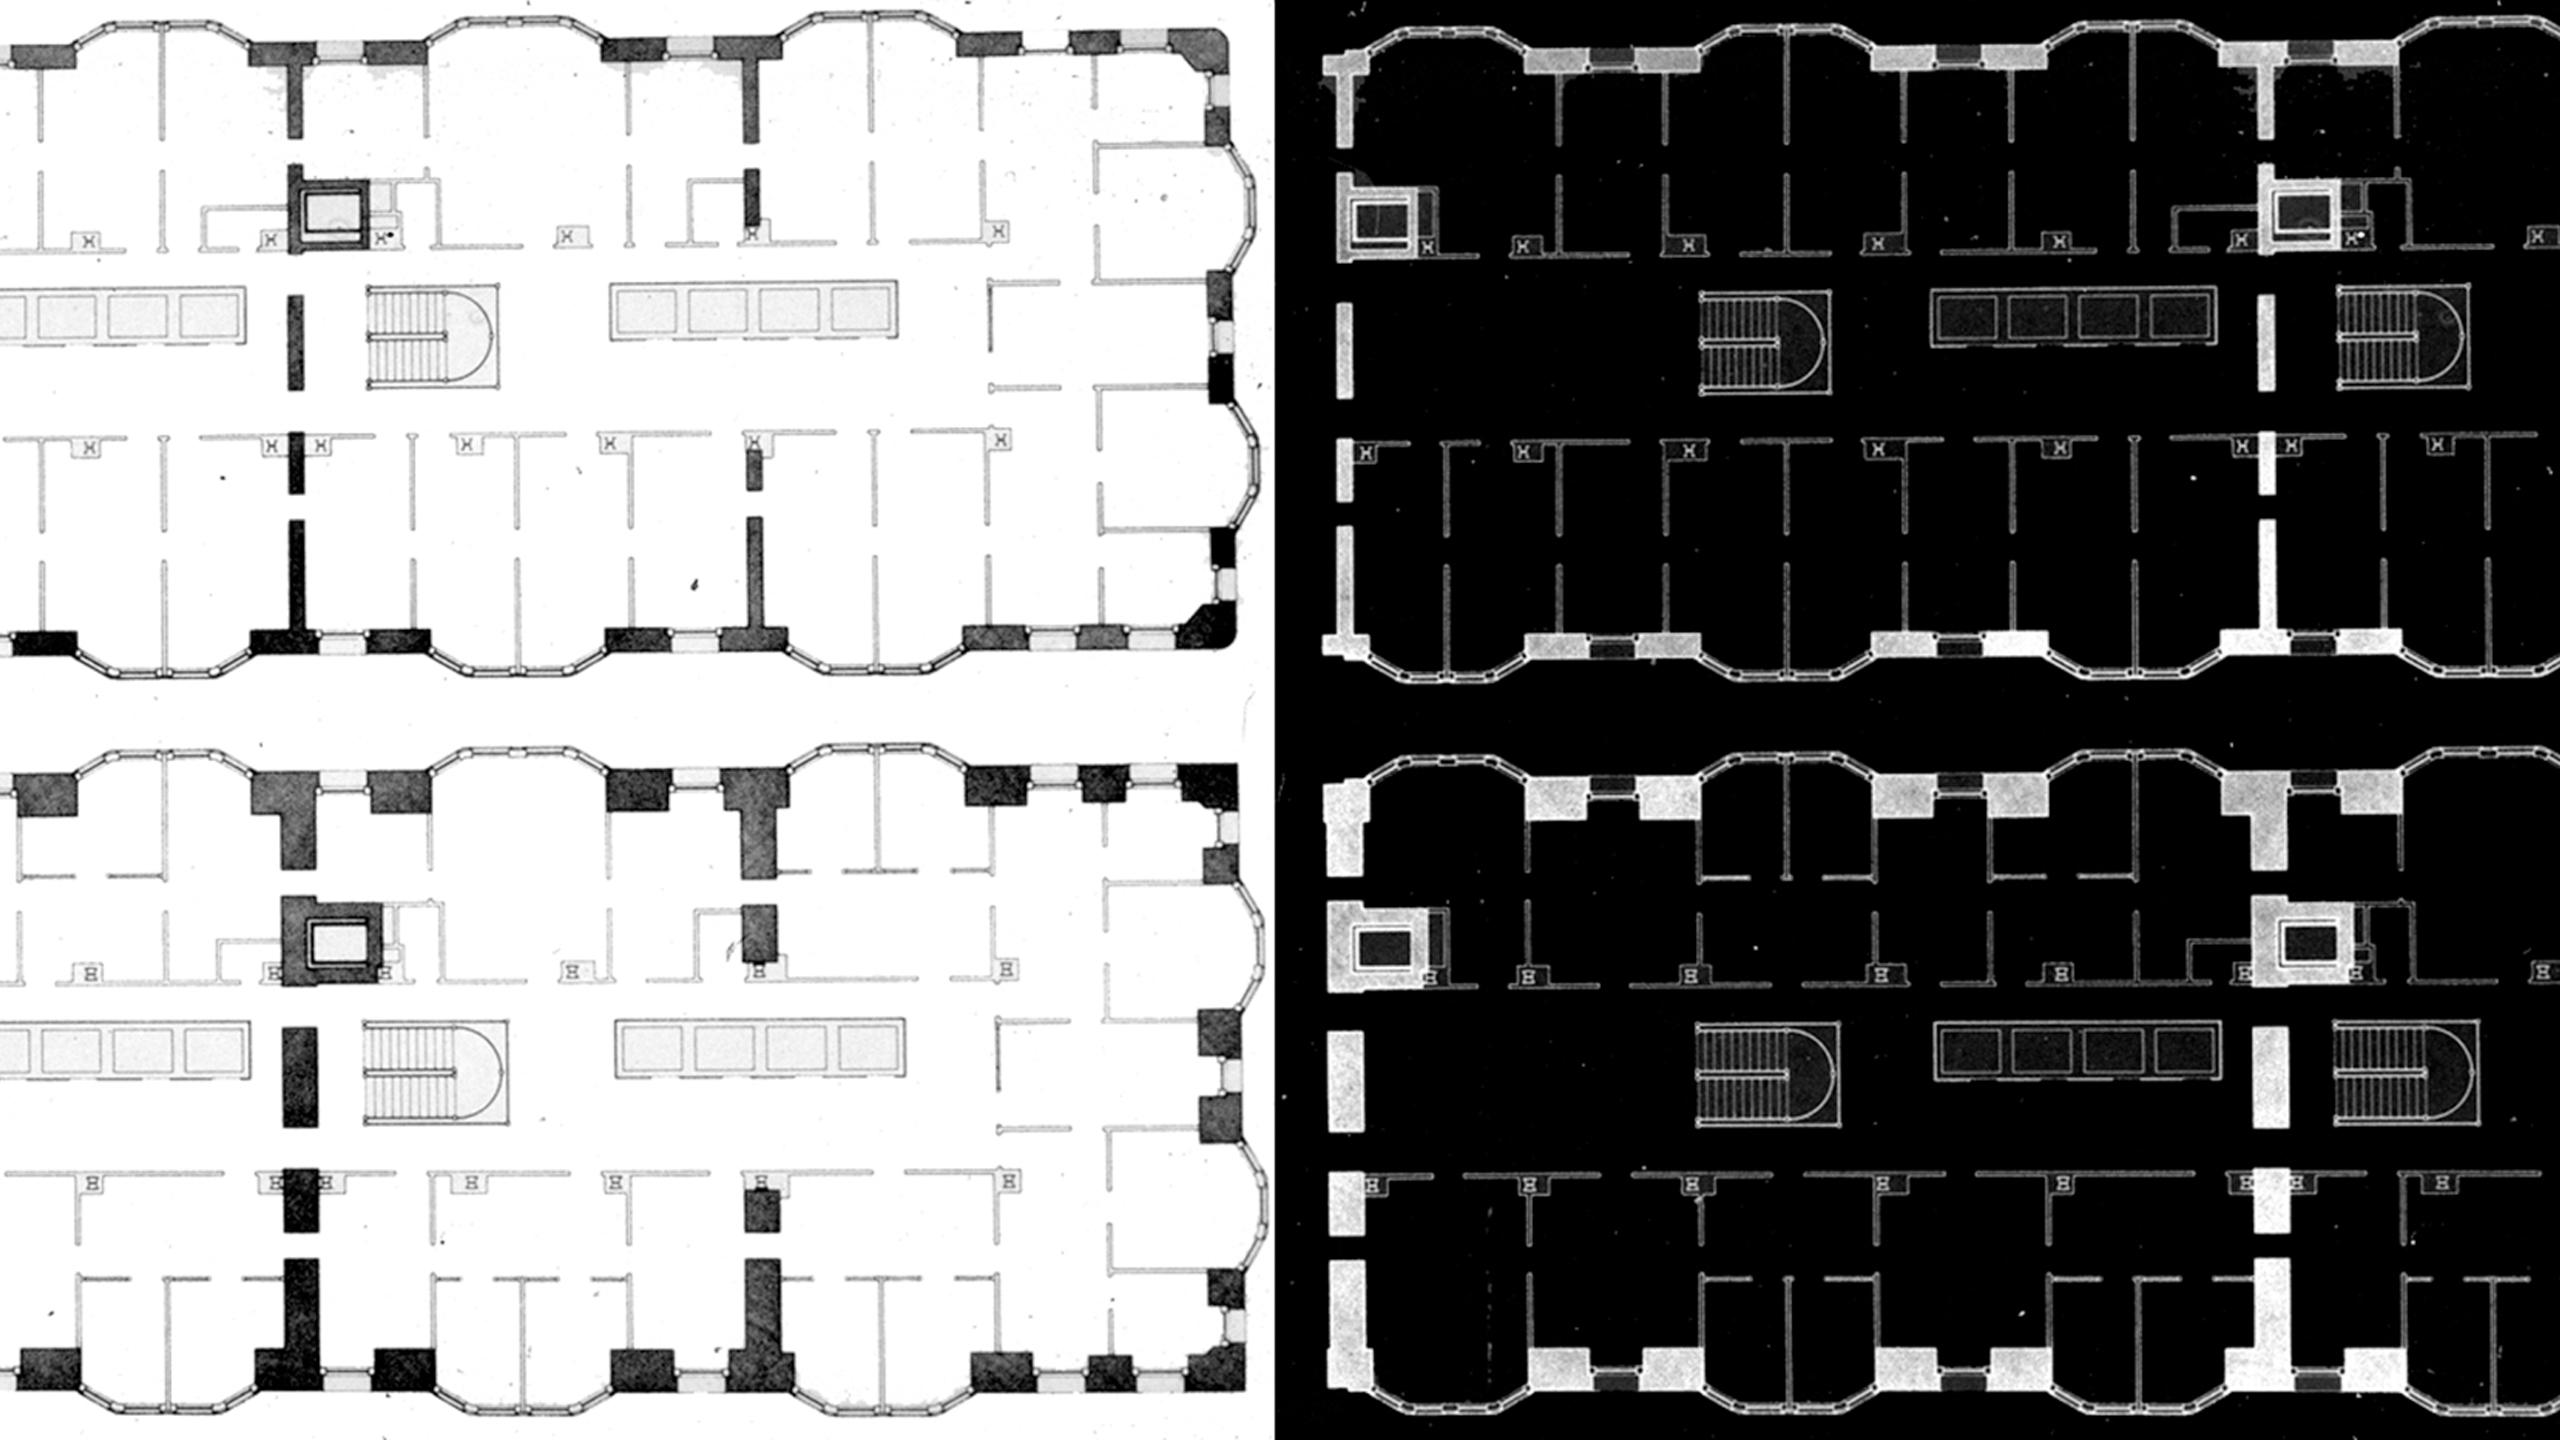 Authenticity in Design: Monadnock Building Floor Plans – Board & Vellum Night School